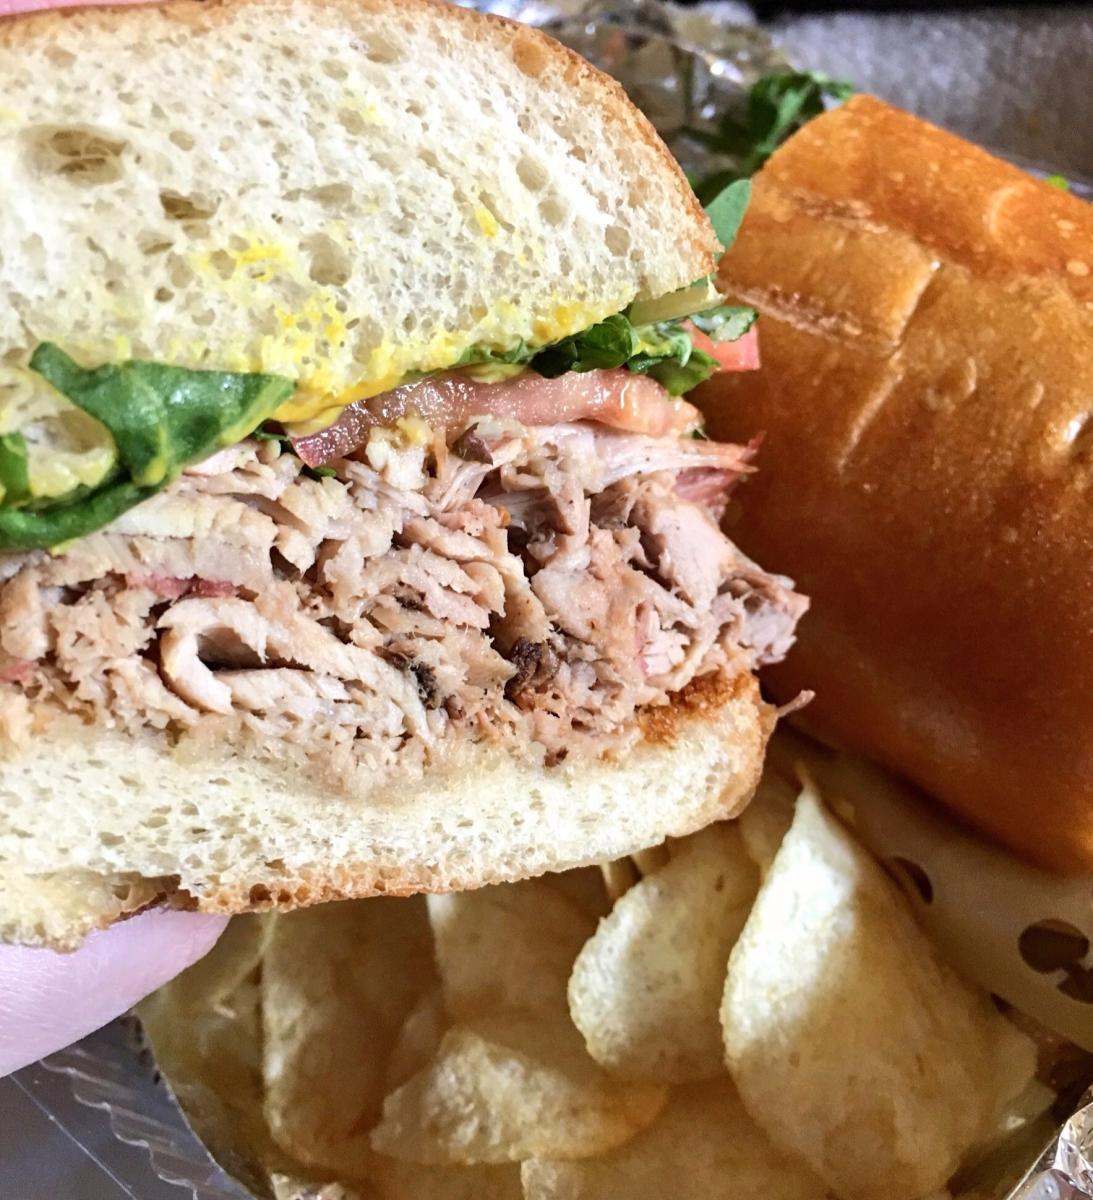 Sandwich at Amelia